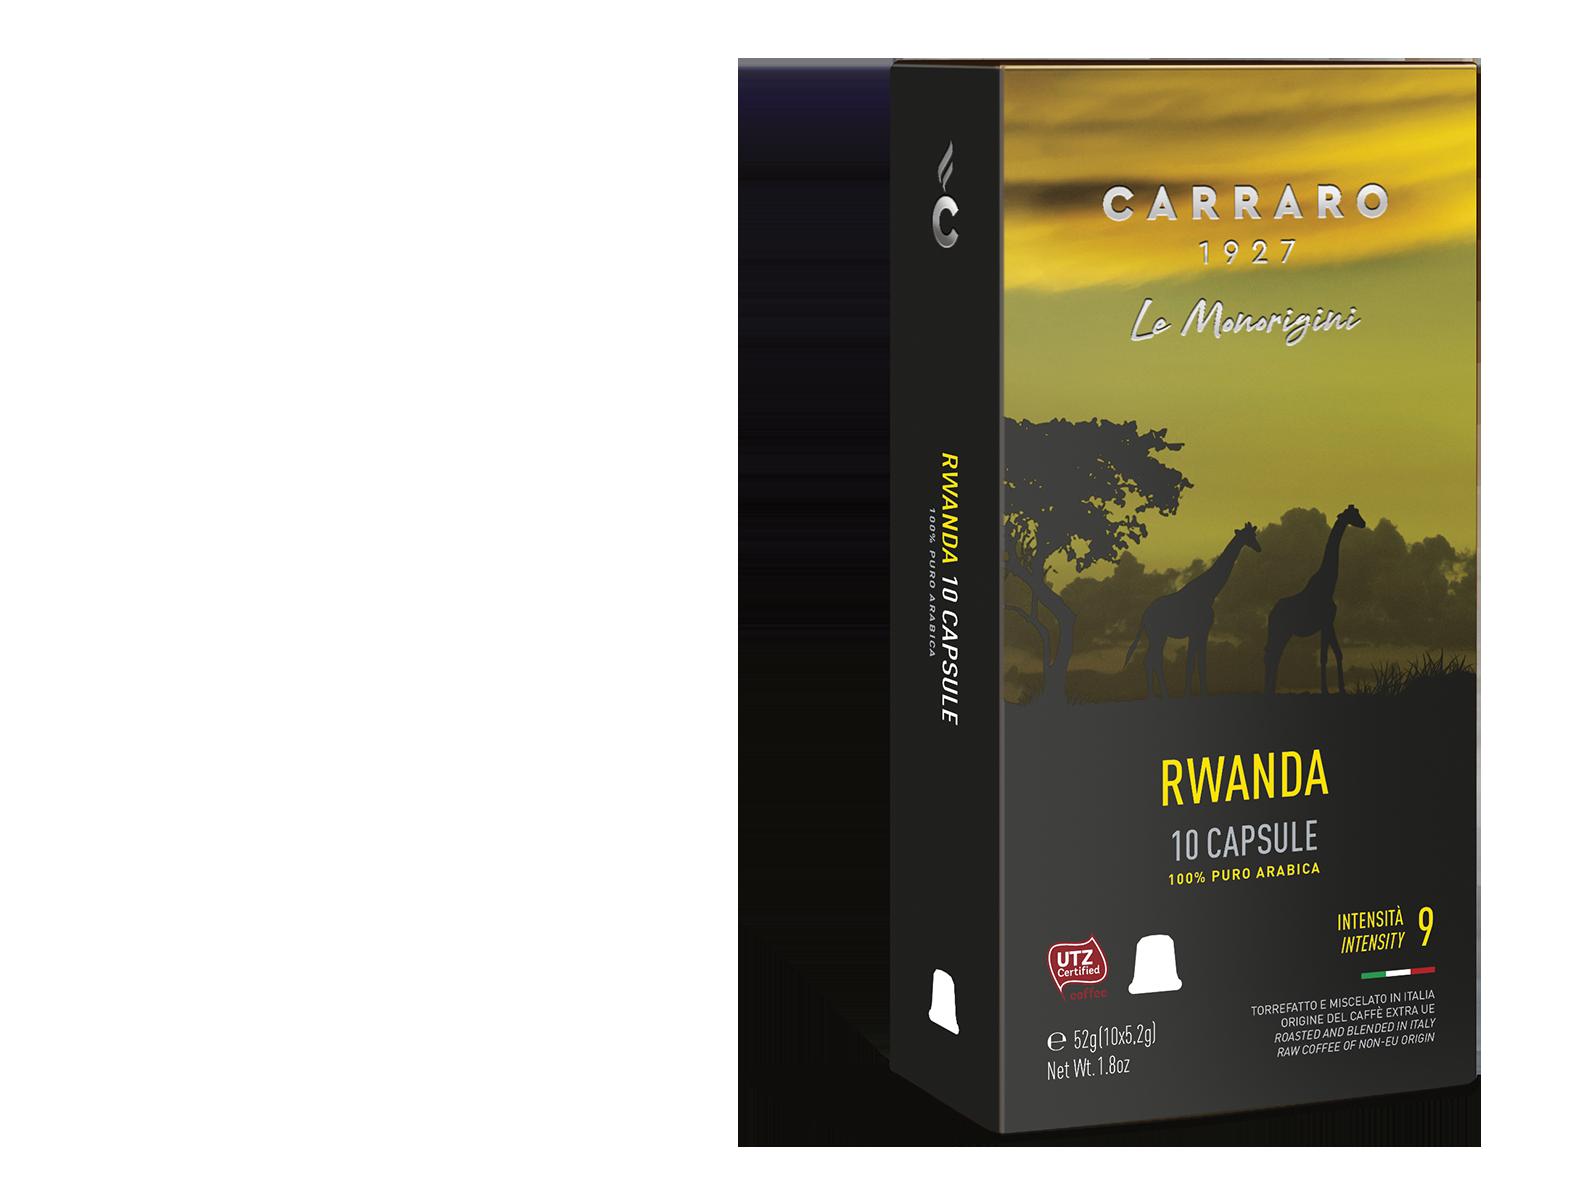 Rwanda – 10 capsule premium